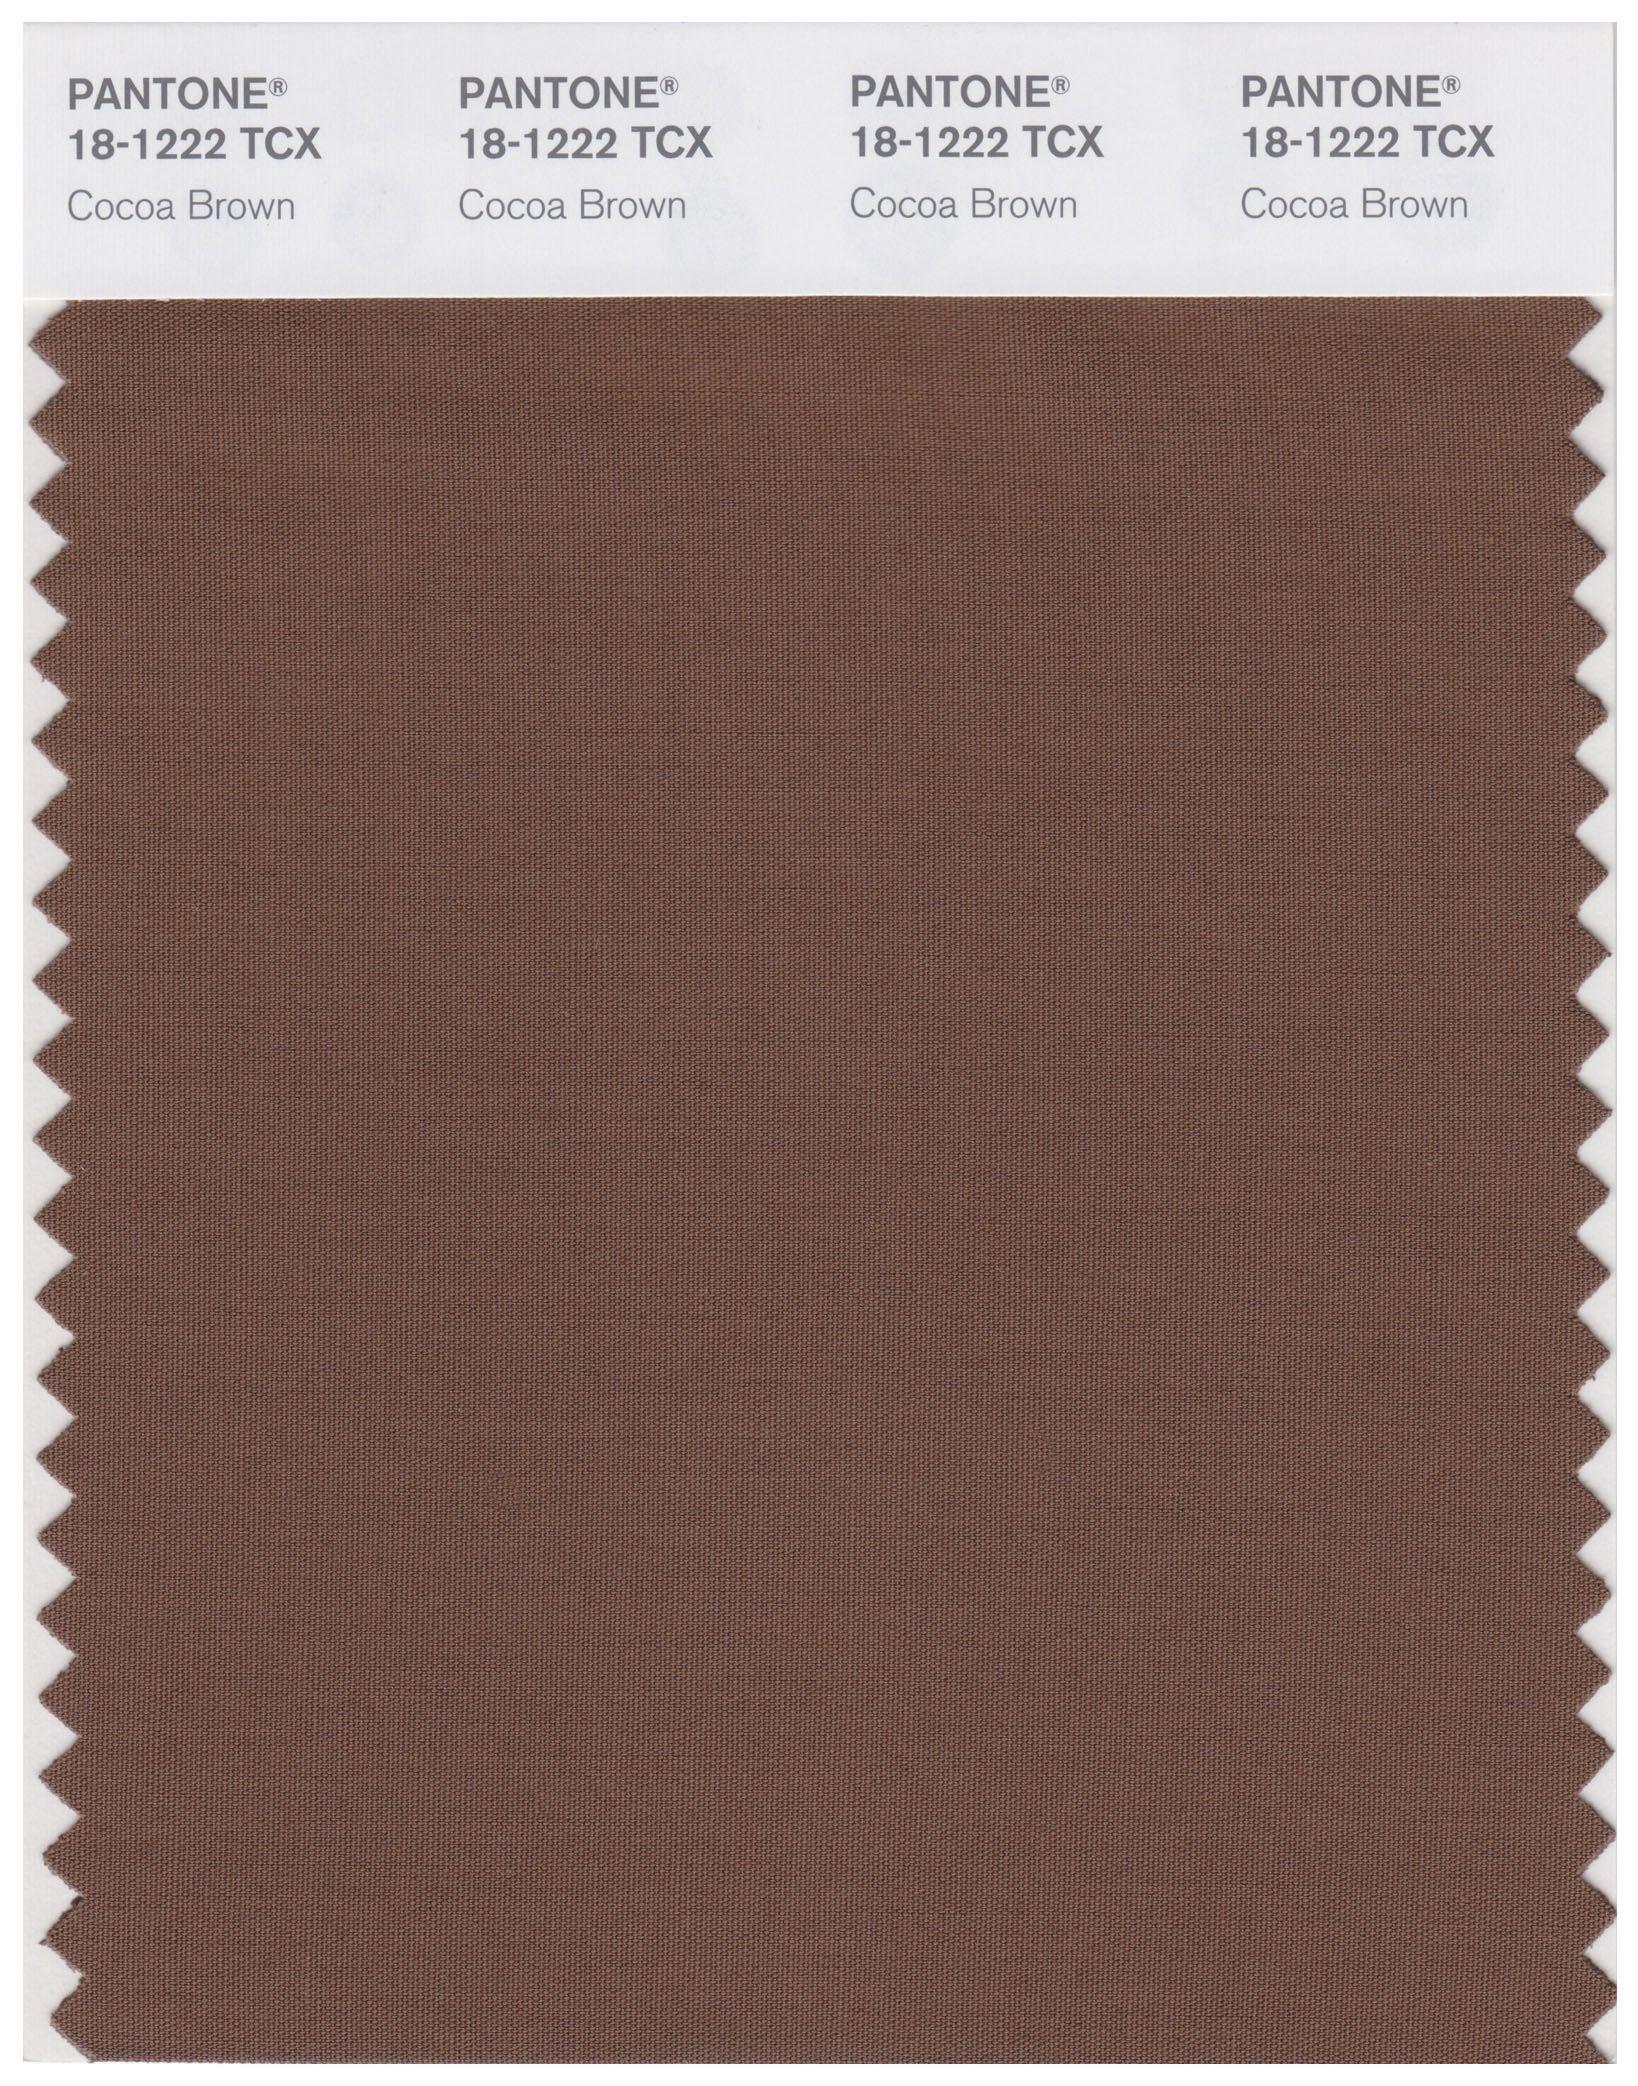 Pantone Smart 18 1222 Tcx Color Swatch Card Cocoa Brown Pantone Color Swatch Cocoa Brown